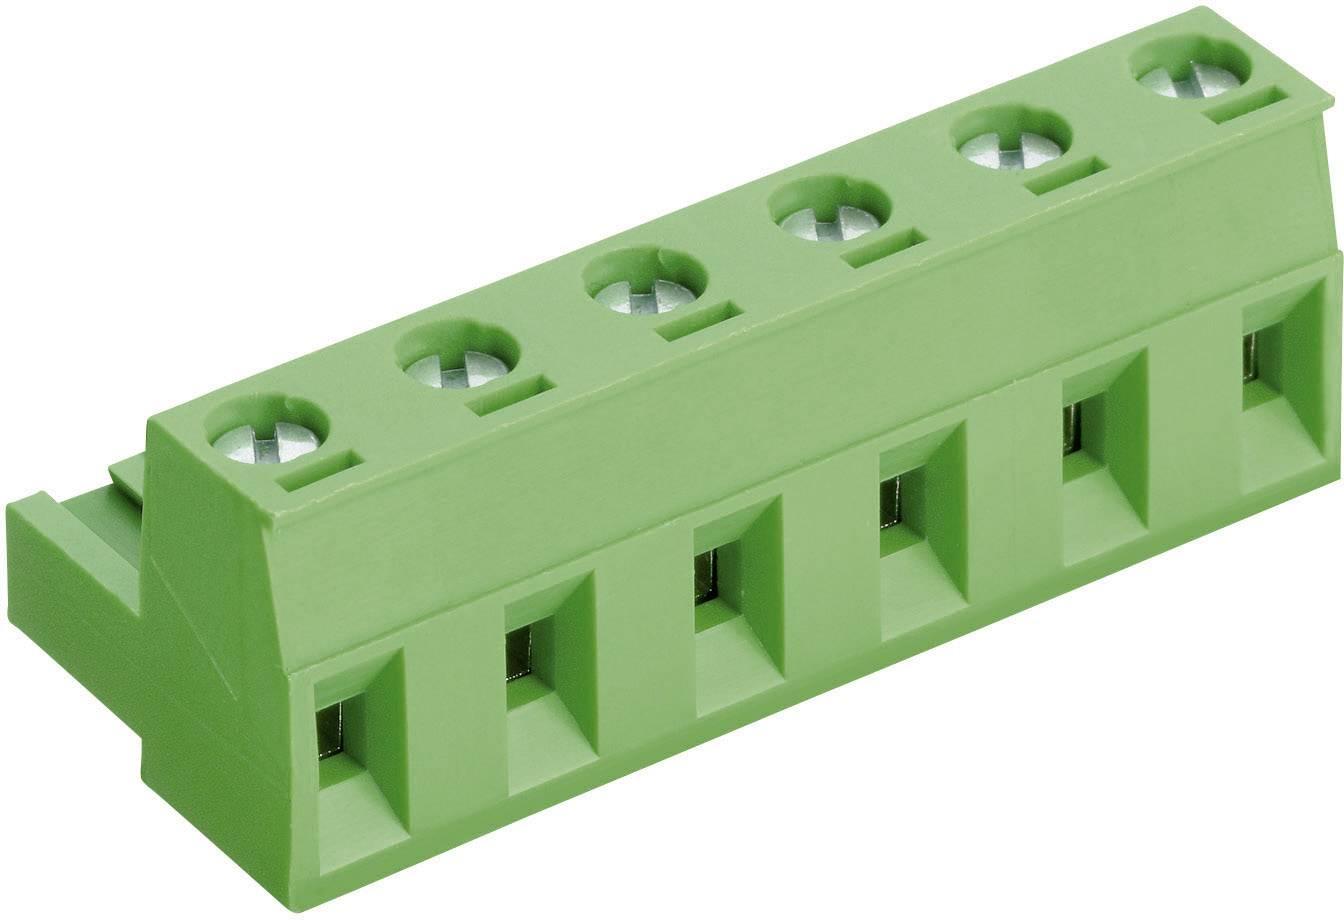 Zásuvkové púzdro na kábel PTR AKZ960/8-7.62 50960080021D, 58.96 mm, pólů 8, rozteč 7.62 mm, 1 ks